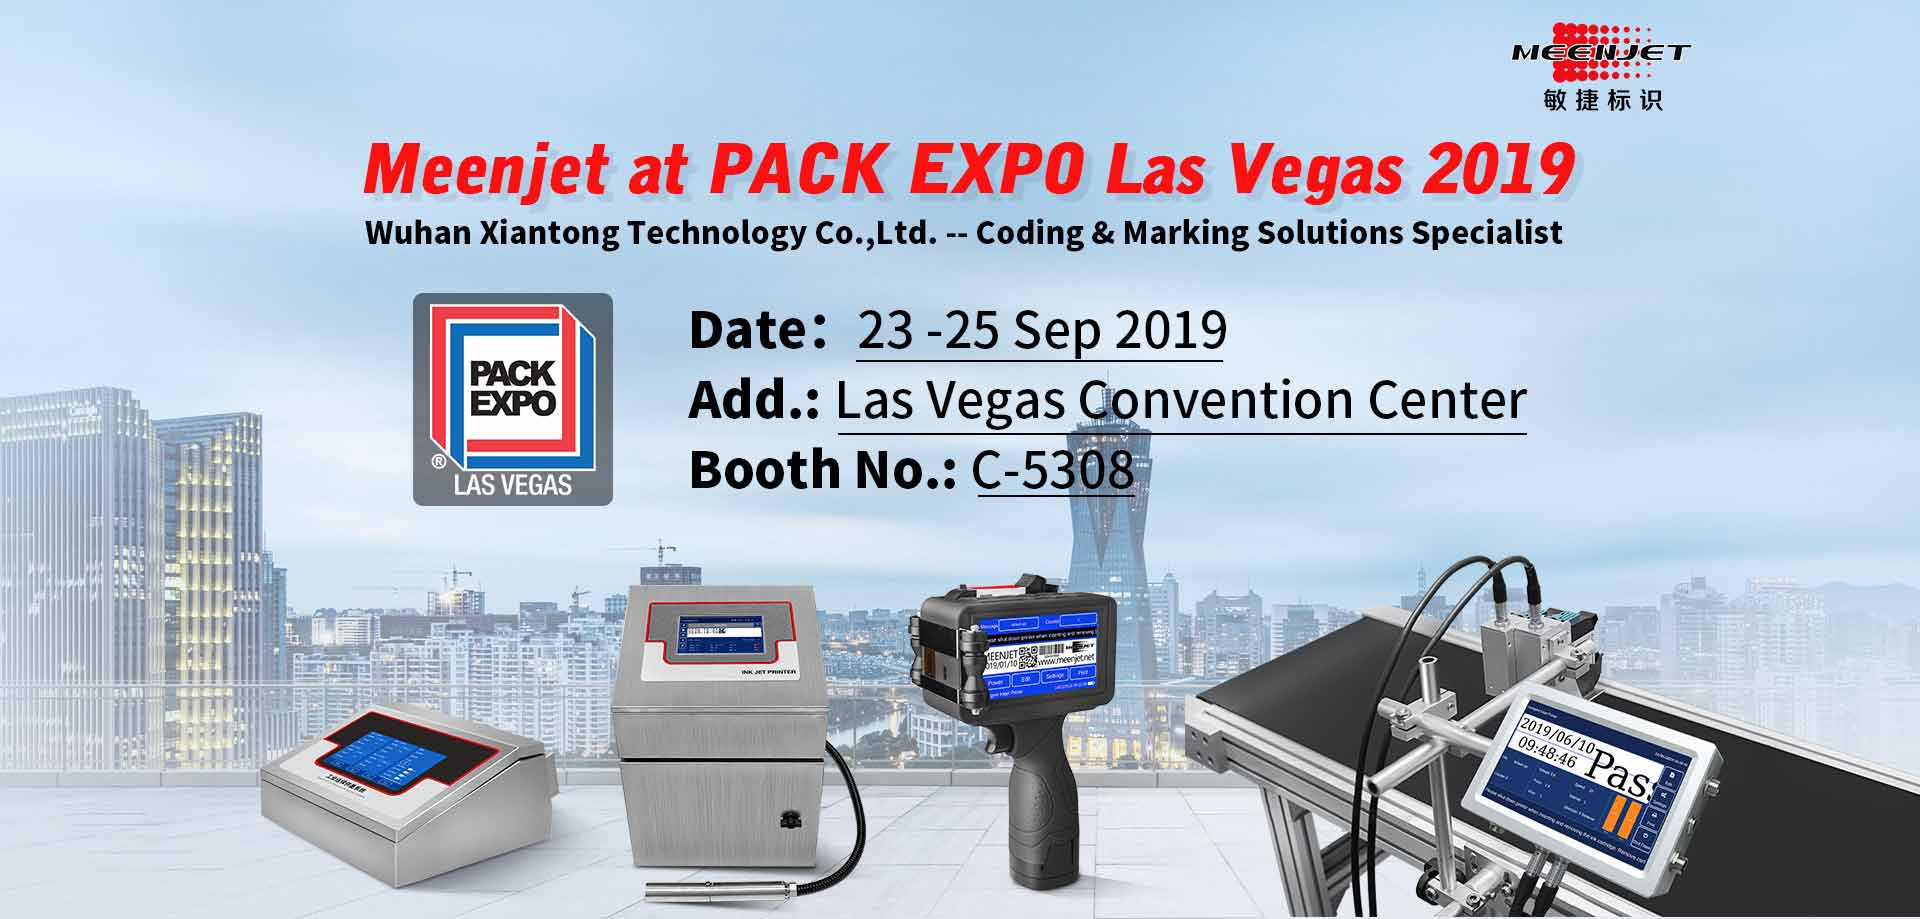 Pack Expo 2019 Meenjet